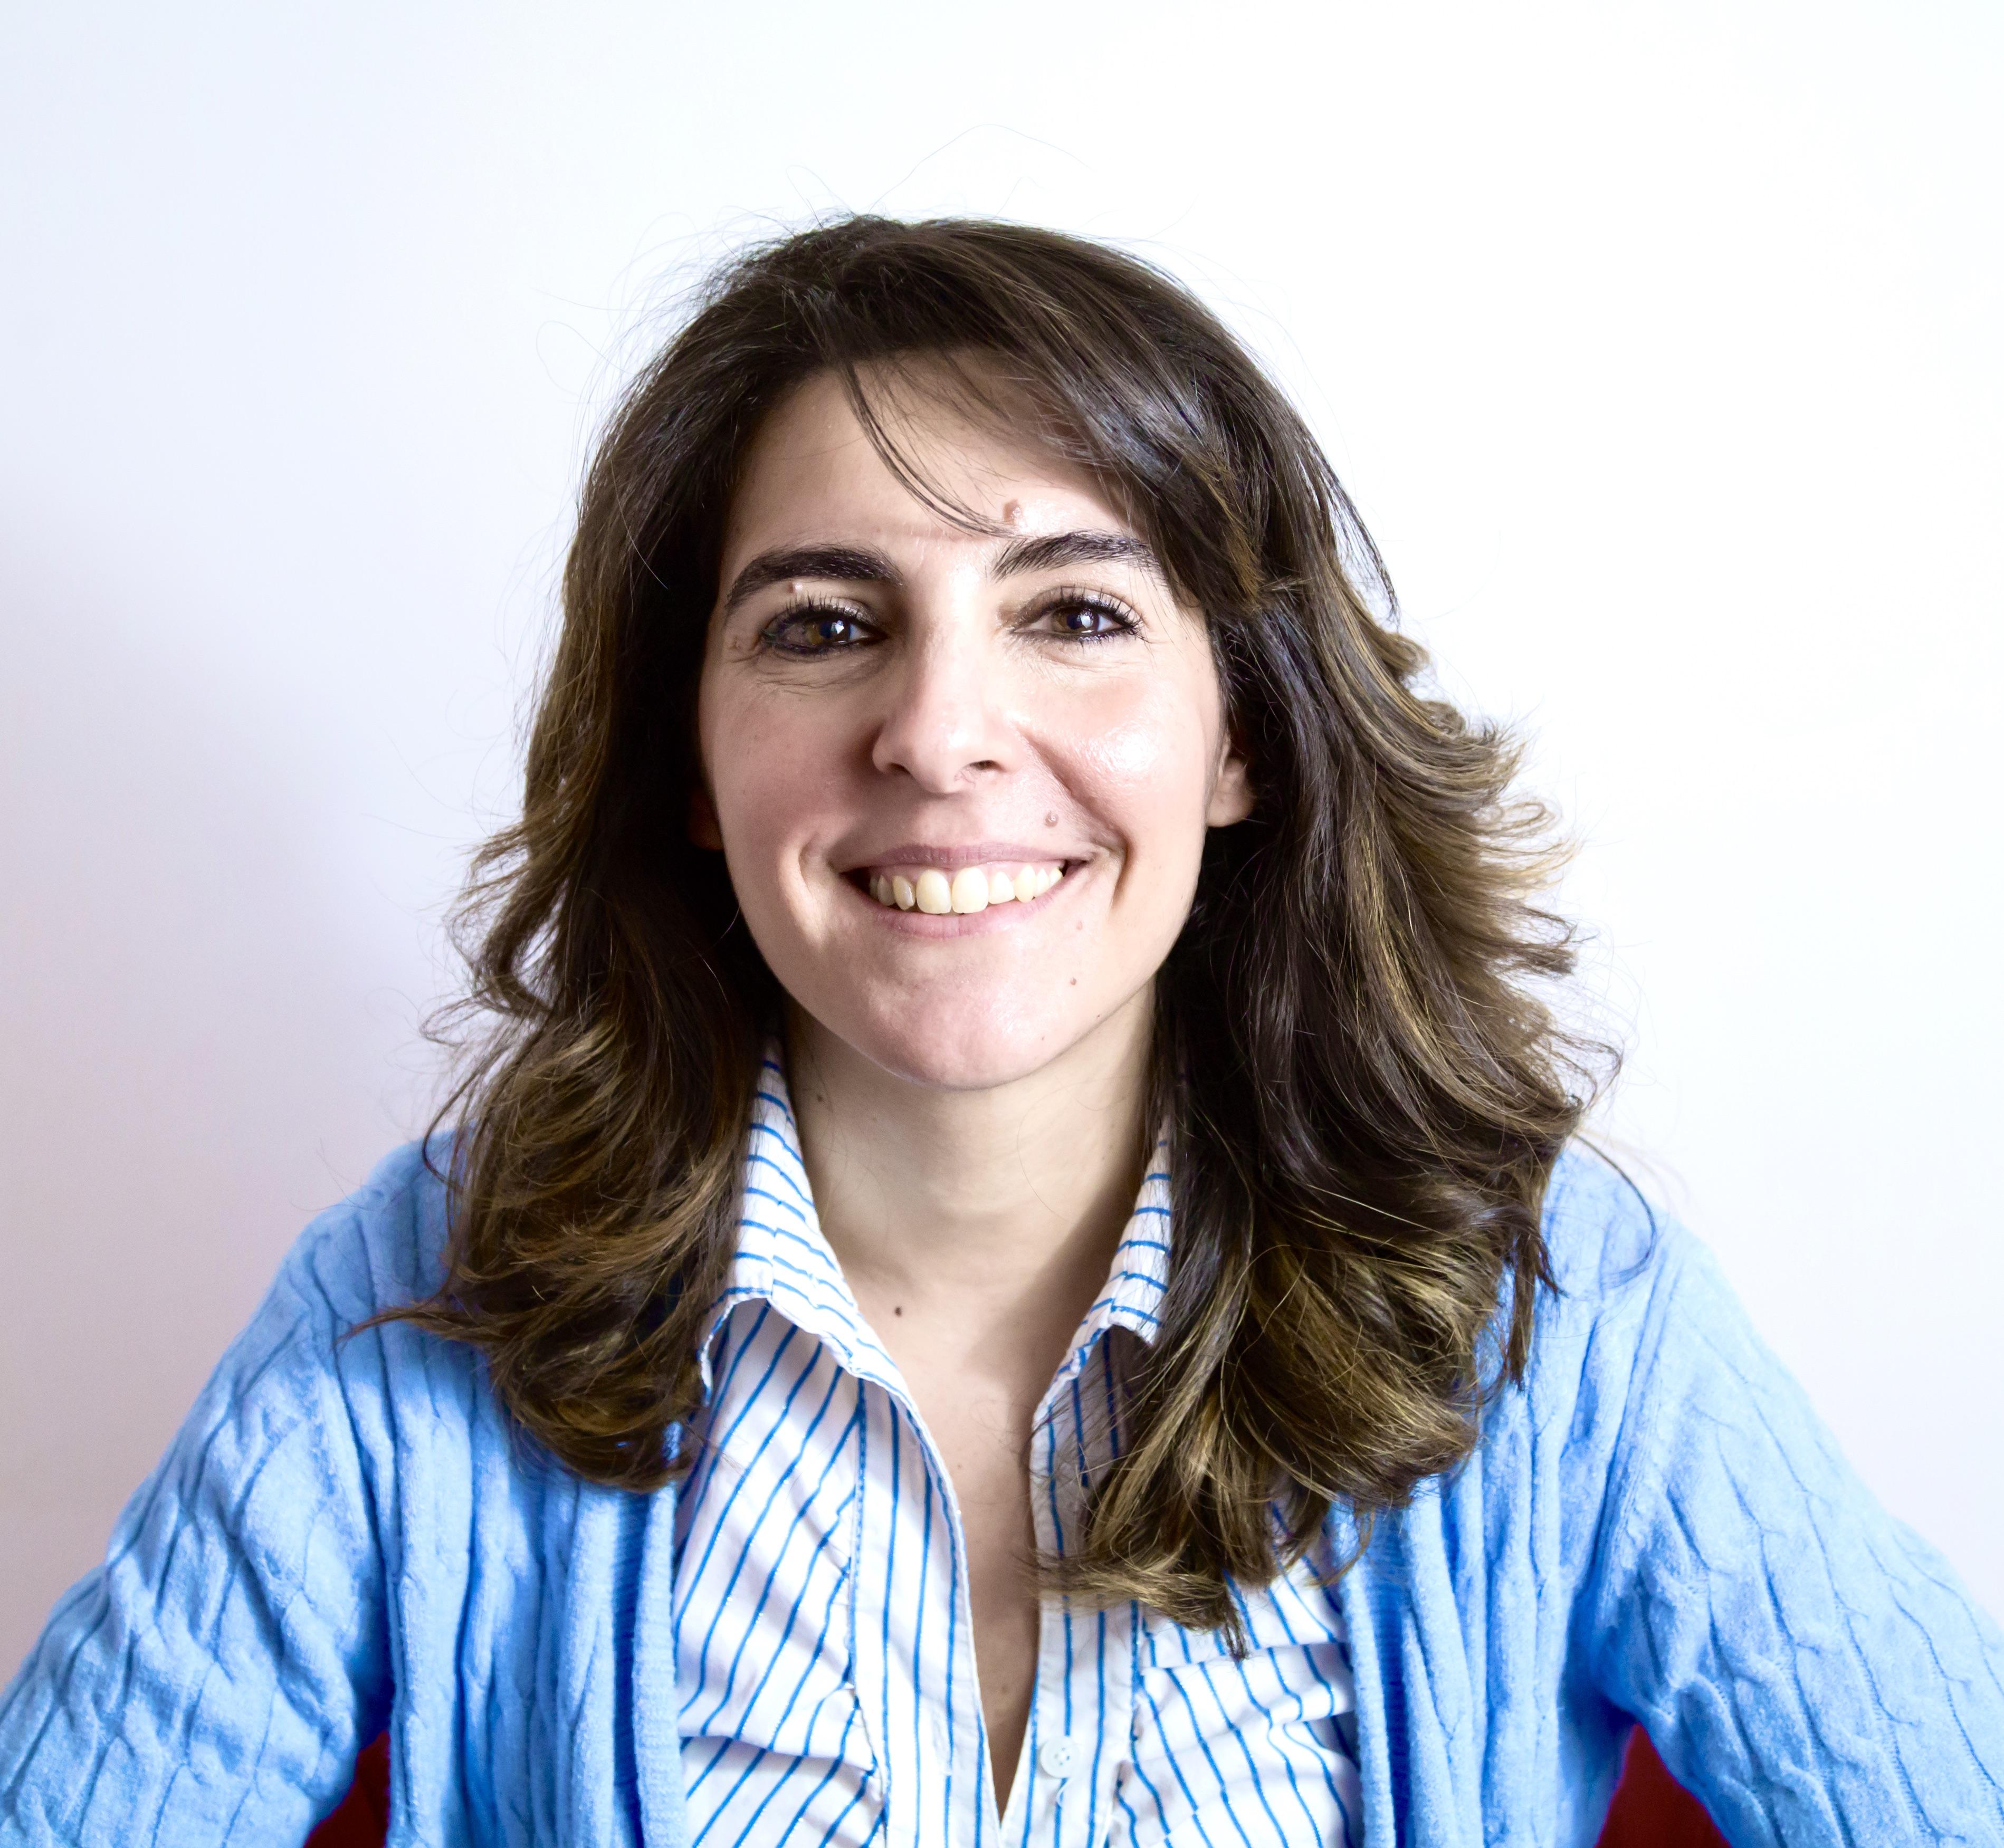 Ilaria De Luca